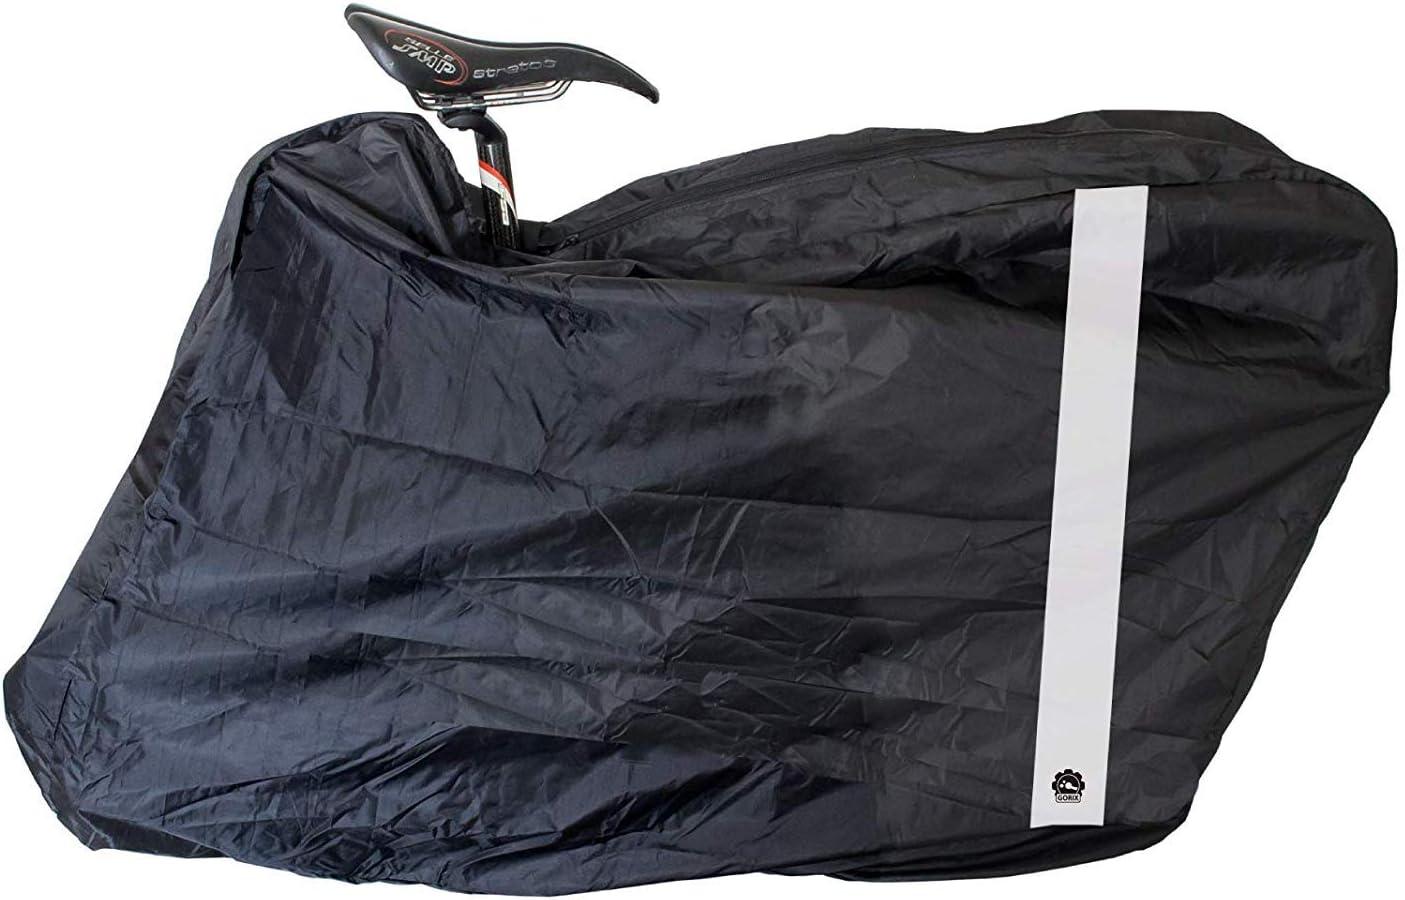 GORIX Bike Travel Bag 5 ☆ popular Case low-pricing Carry Storage Road Transport Luggage